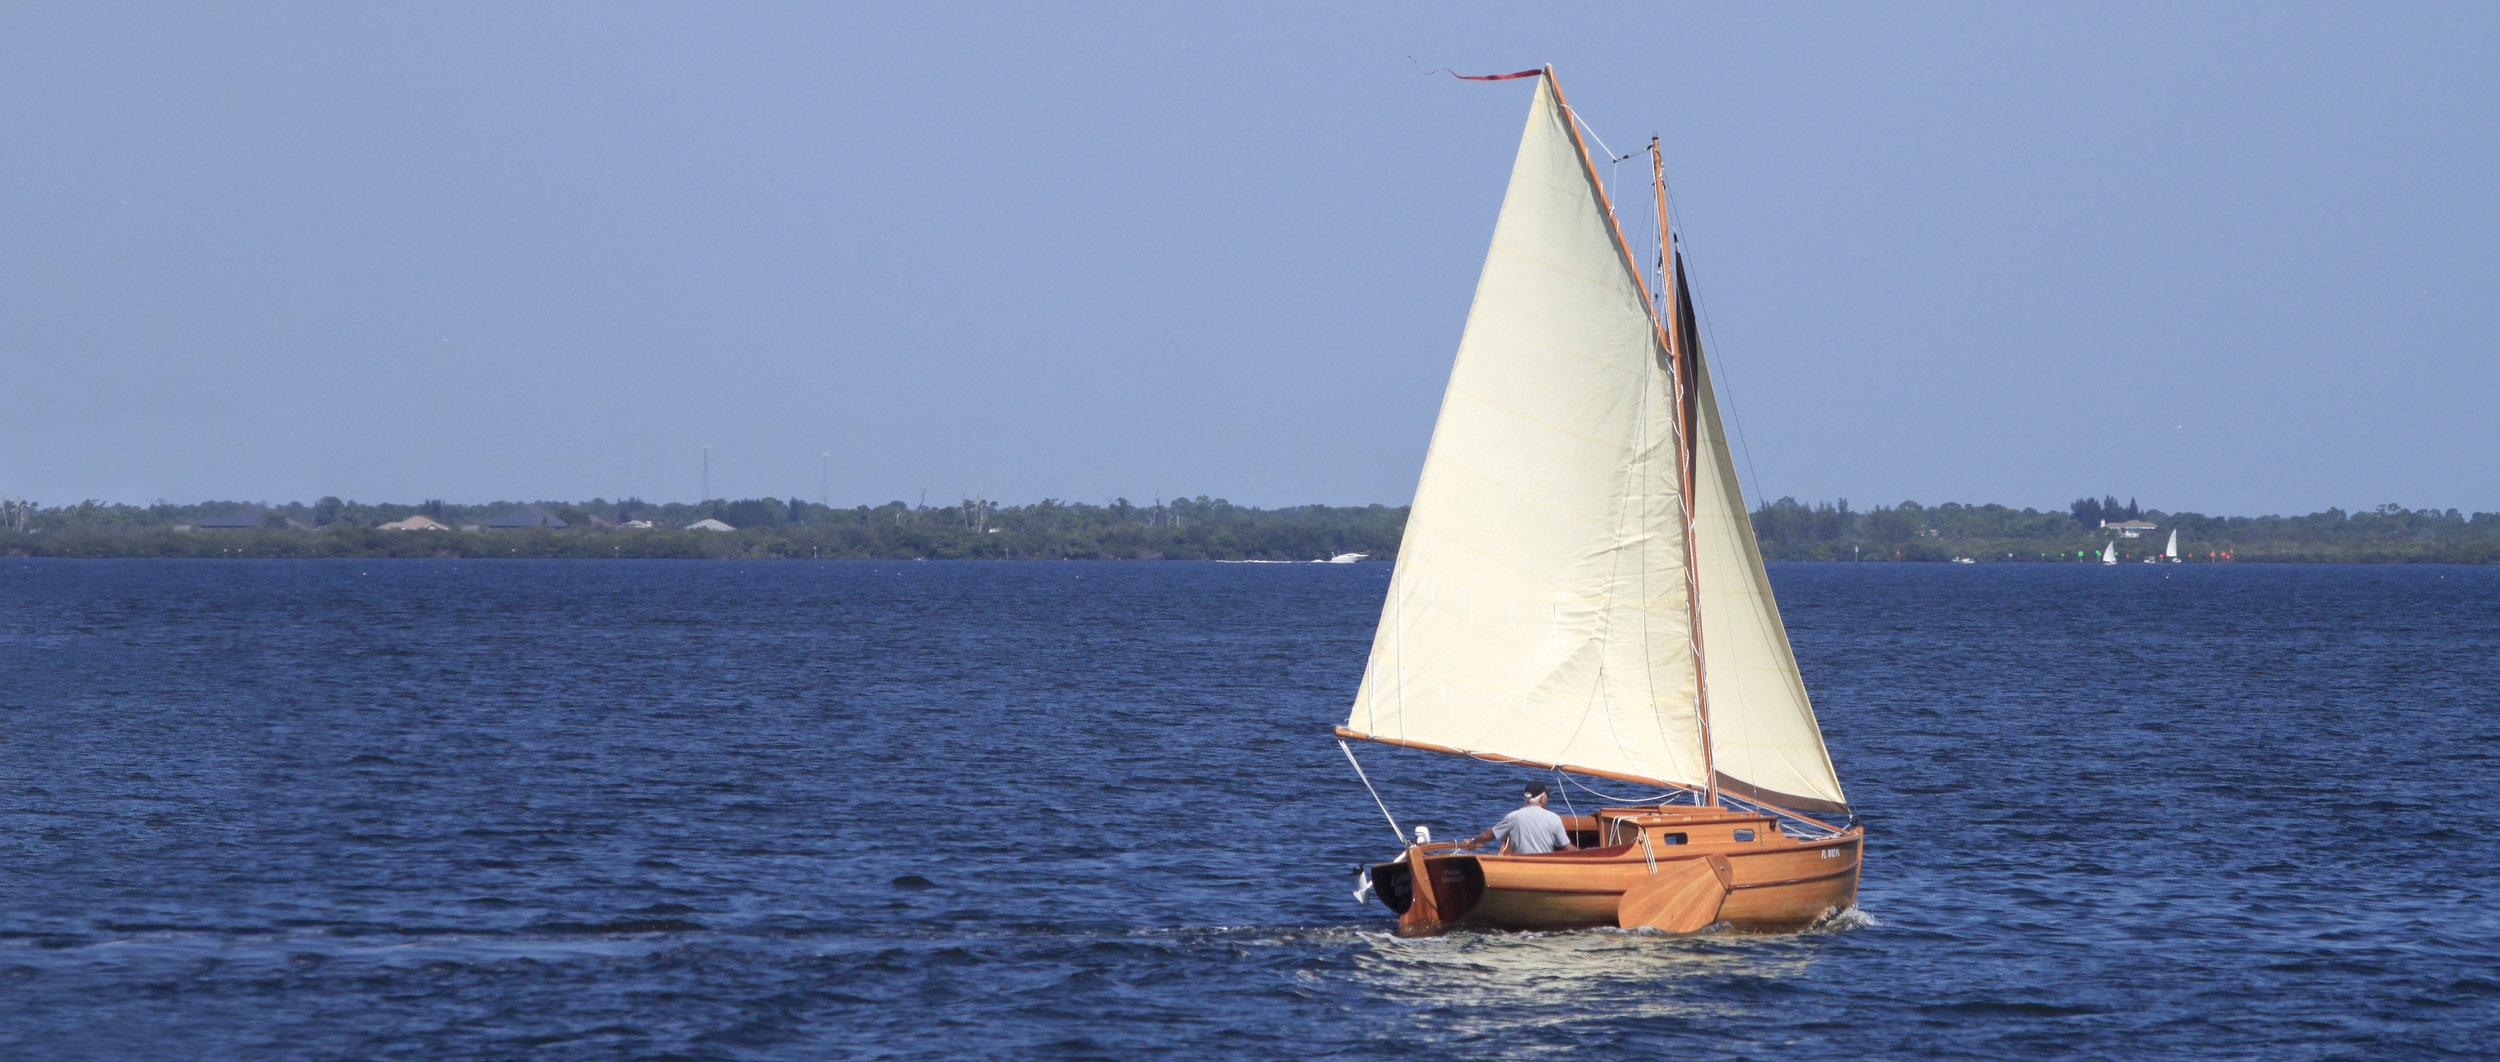 gretchen-chair-sailboat-nicholas-baker